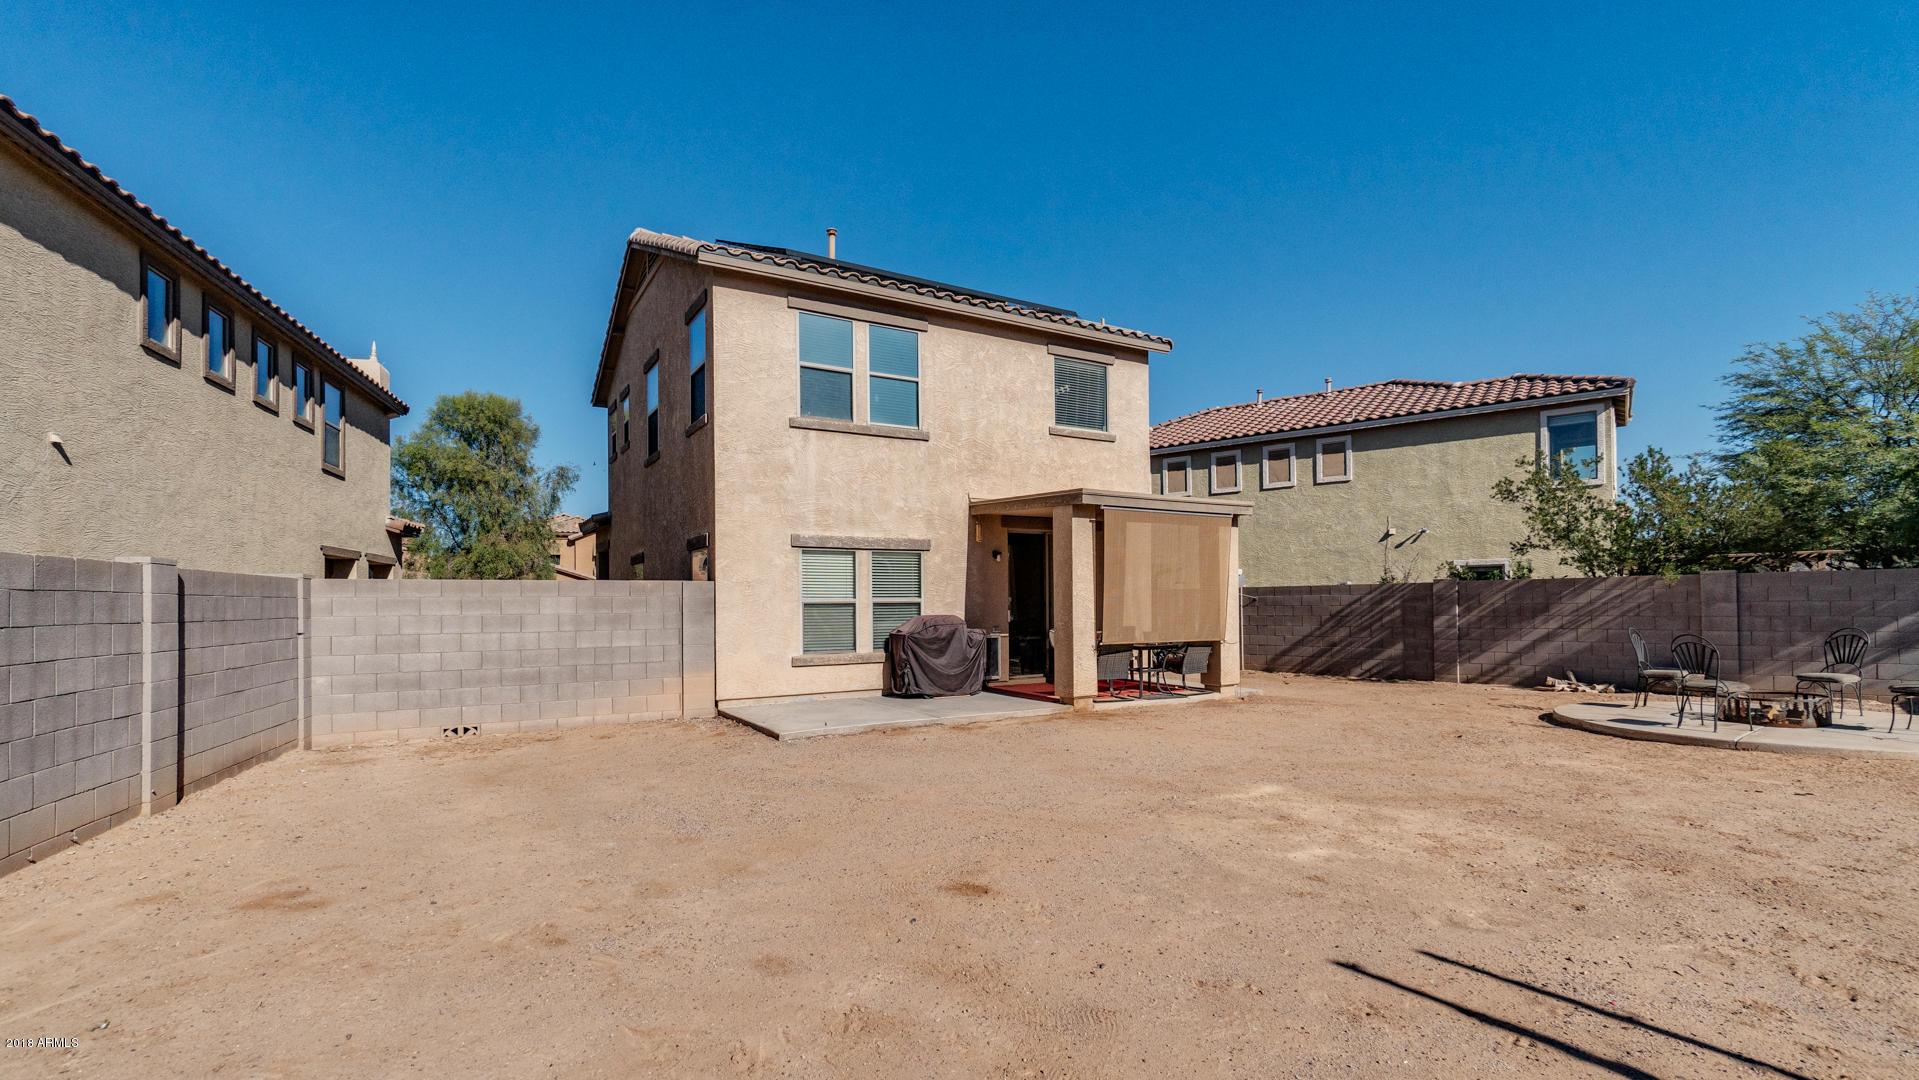 MLS 5845636 40381 W PEGGY Court, Maricopa, AZ 85138 Maricopa AZ Desert Passage